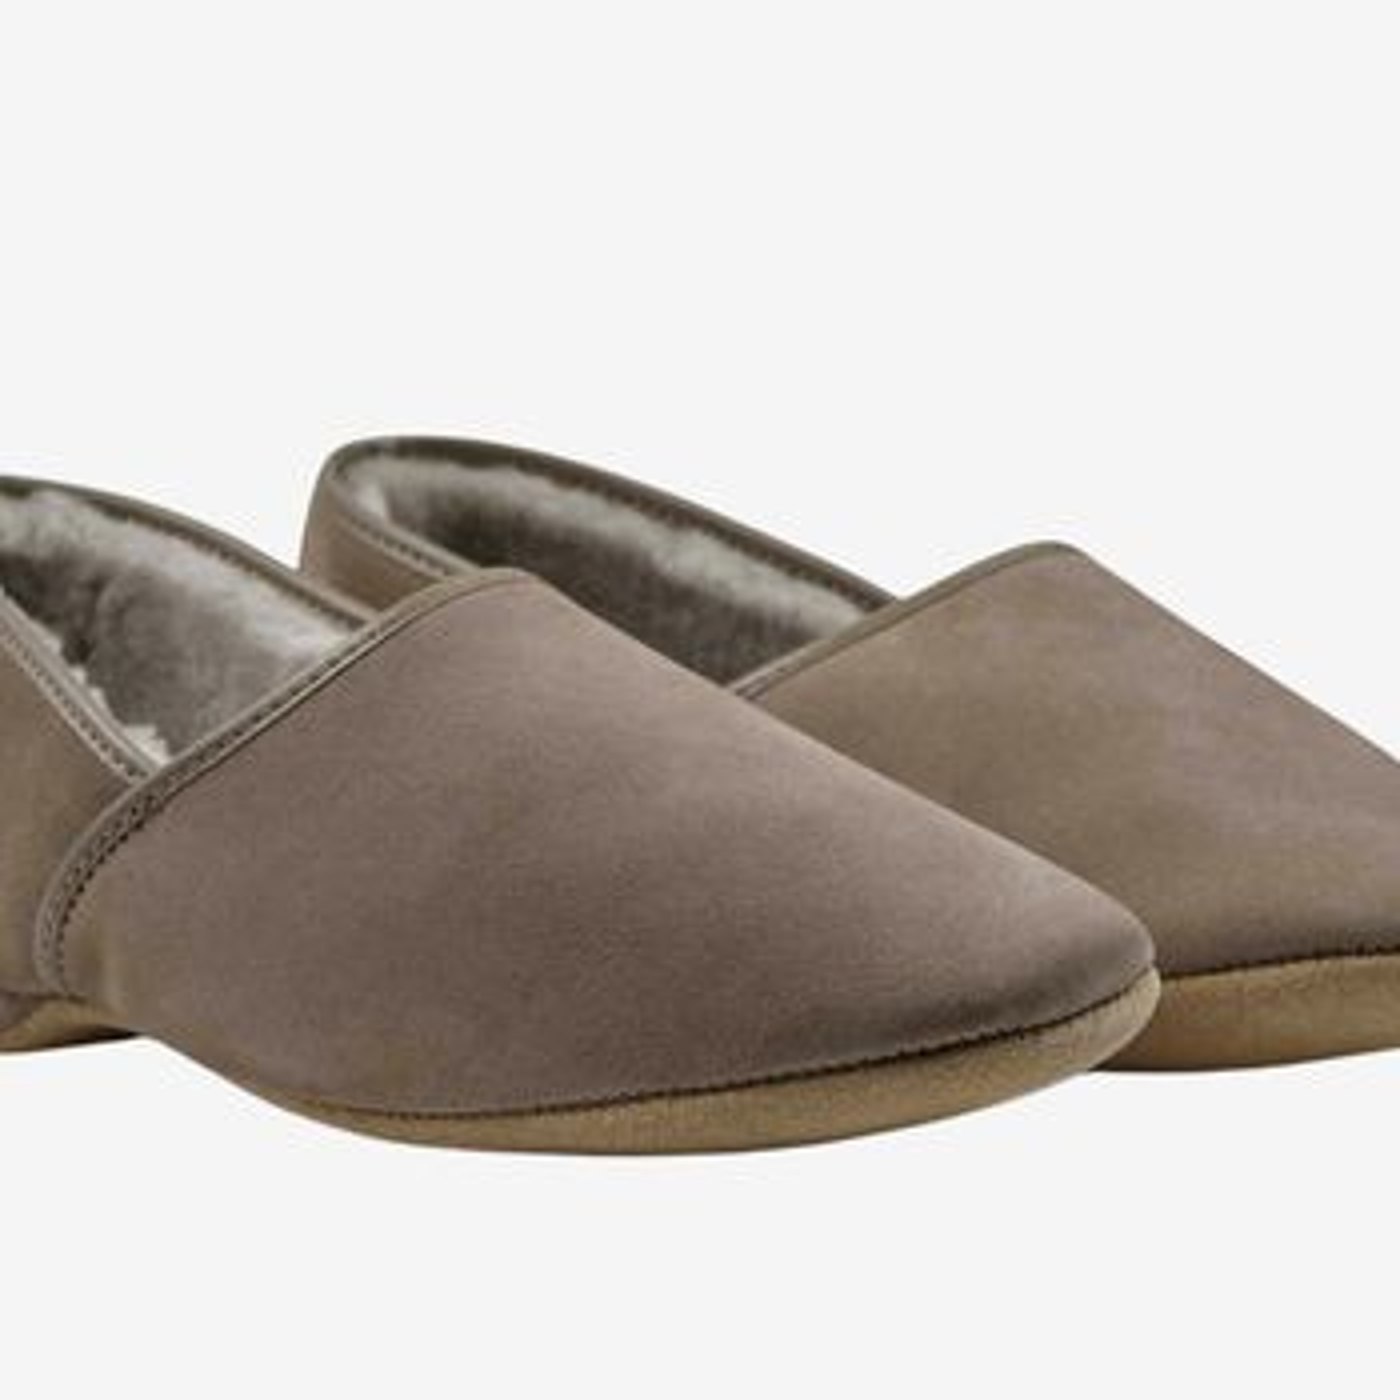 Derek Rose Taupe Suede Sheepskin Closed-Back Slippers Fabric